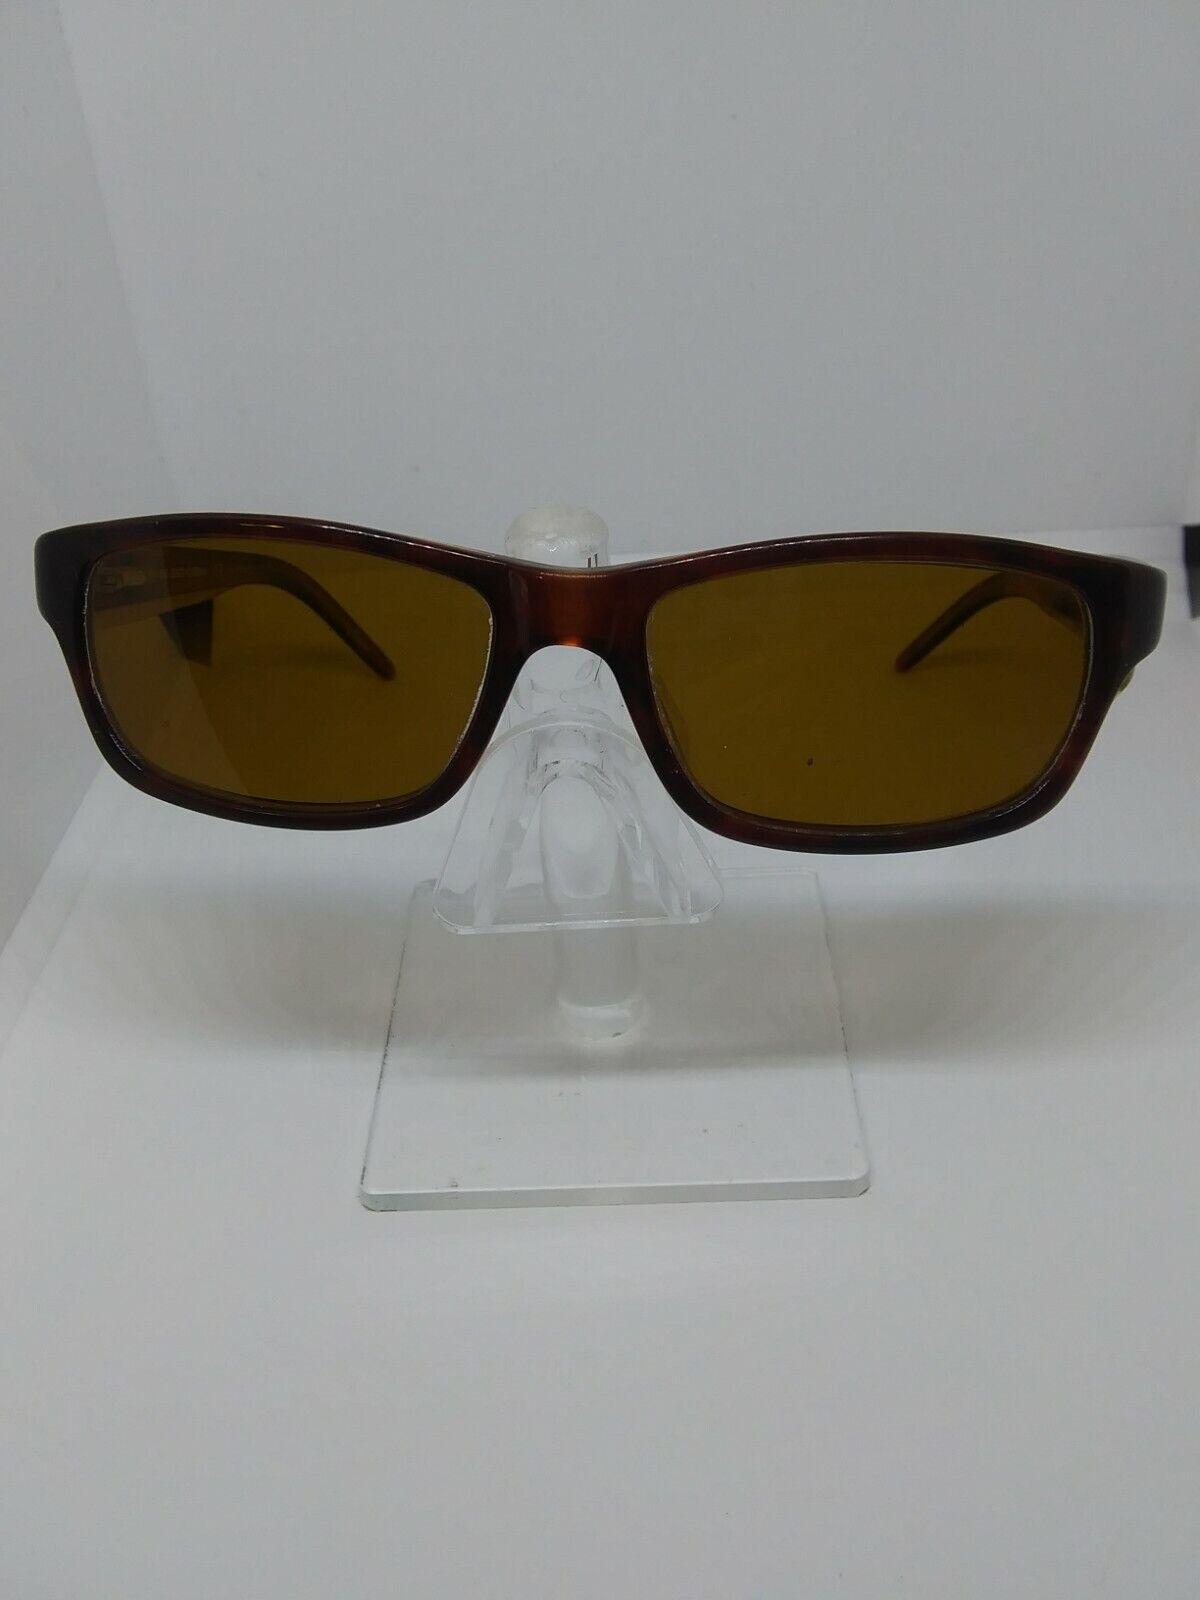 Authentic Dolce & Gabanna D&G 1112 646 53-16-135 Tortoise Frames Pre-Owned